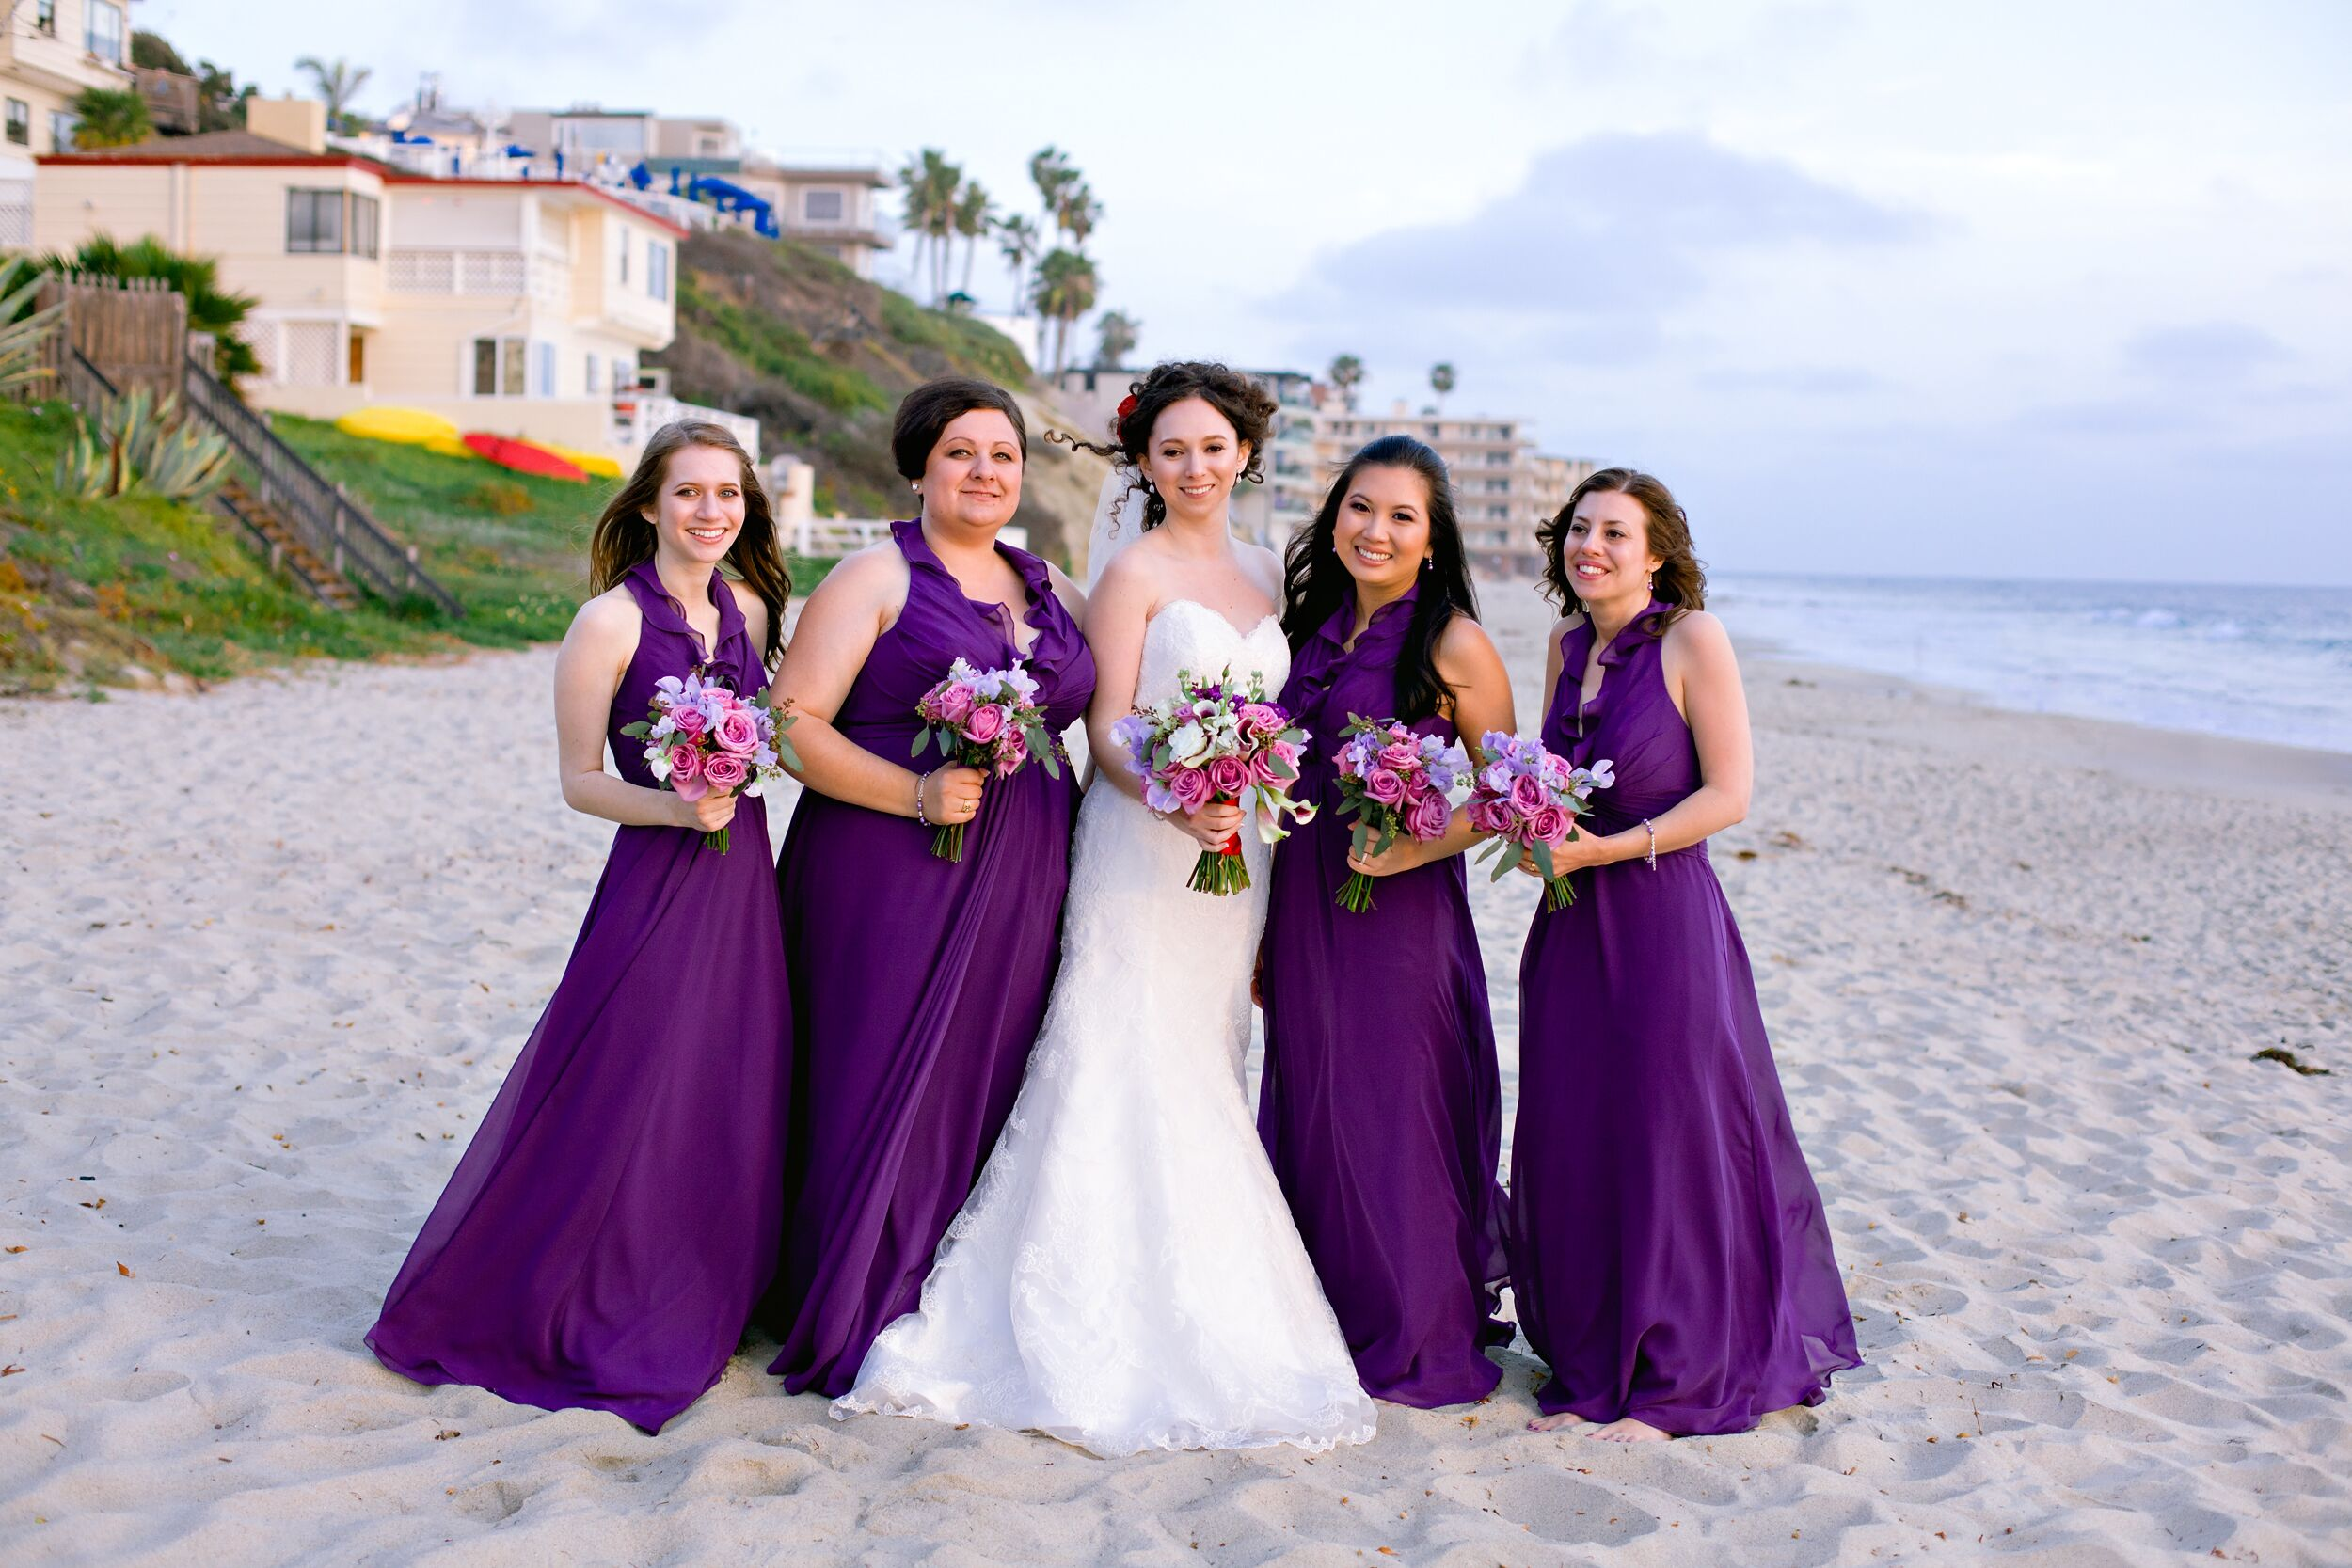 lilac bridesmaid and groom - HD2500×1667